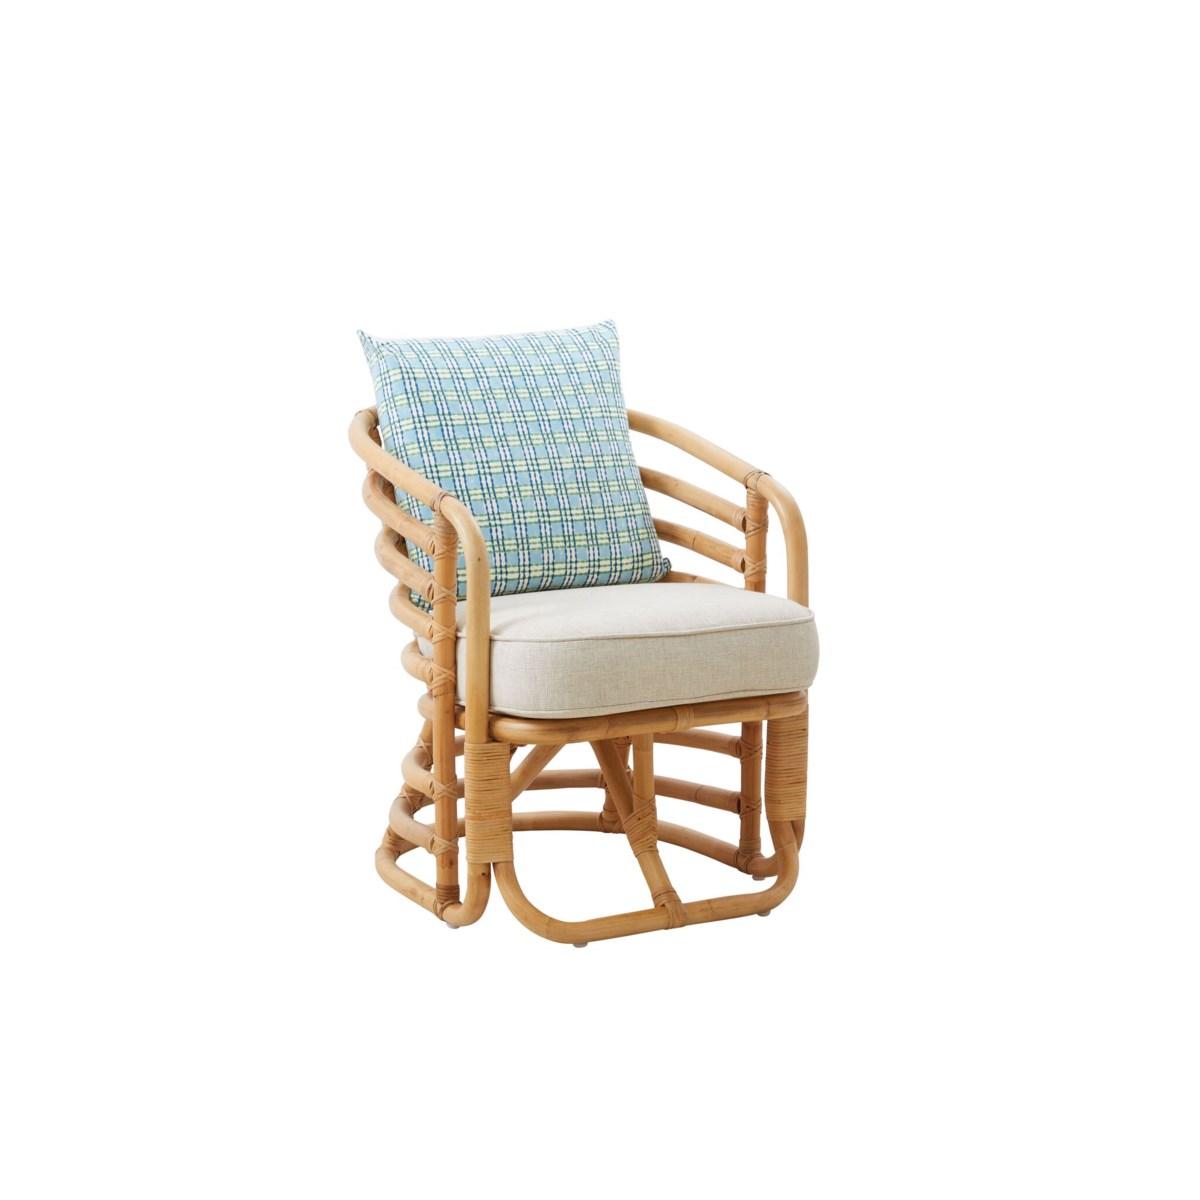 Boat Chair Rattan Vintage Reproduction Color - Antique Honey Cushion Color - Cream